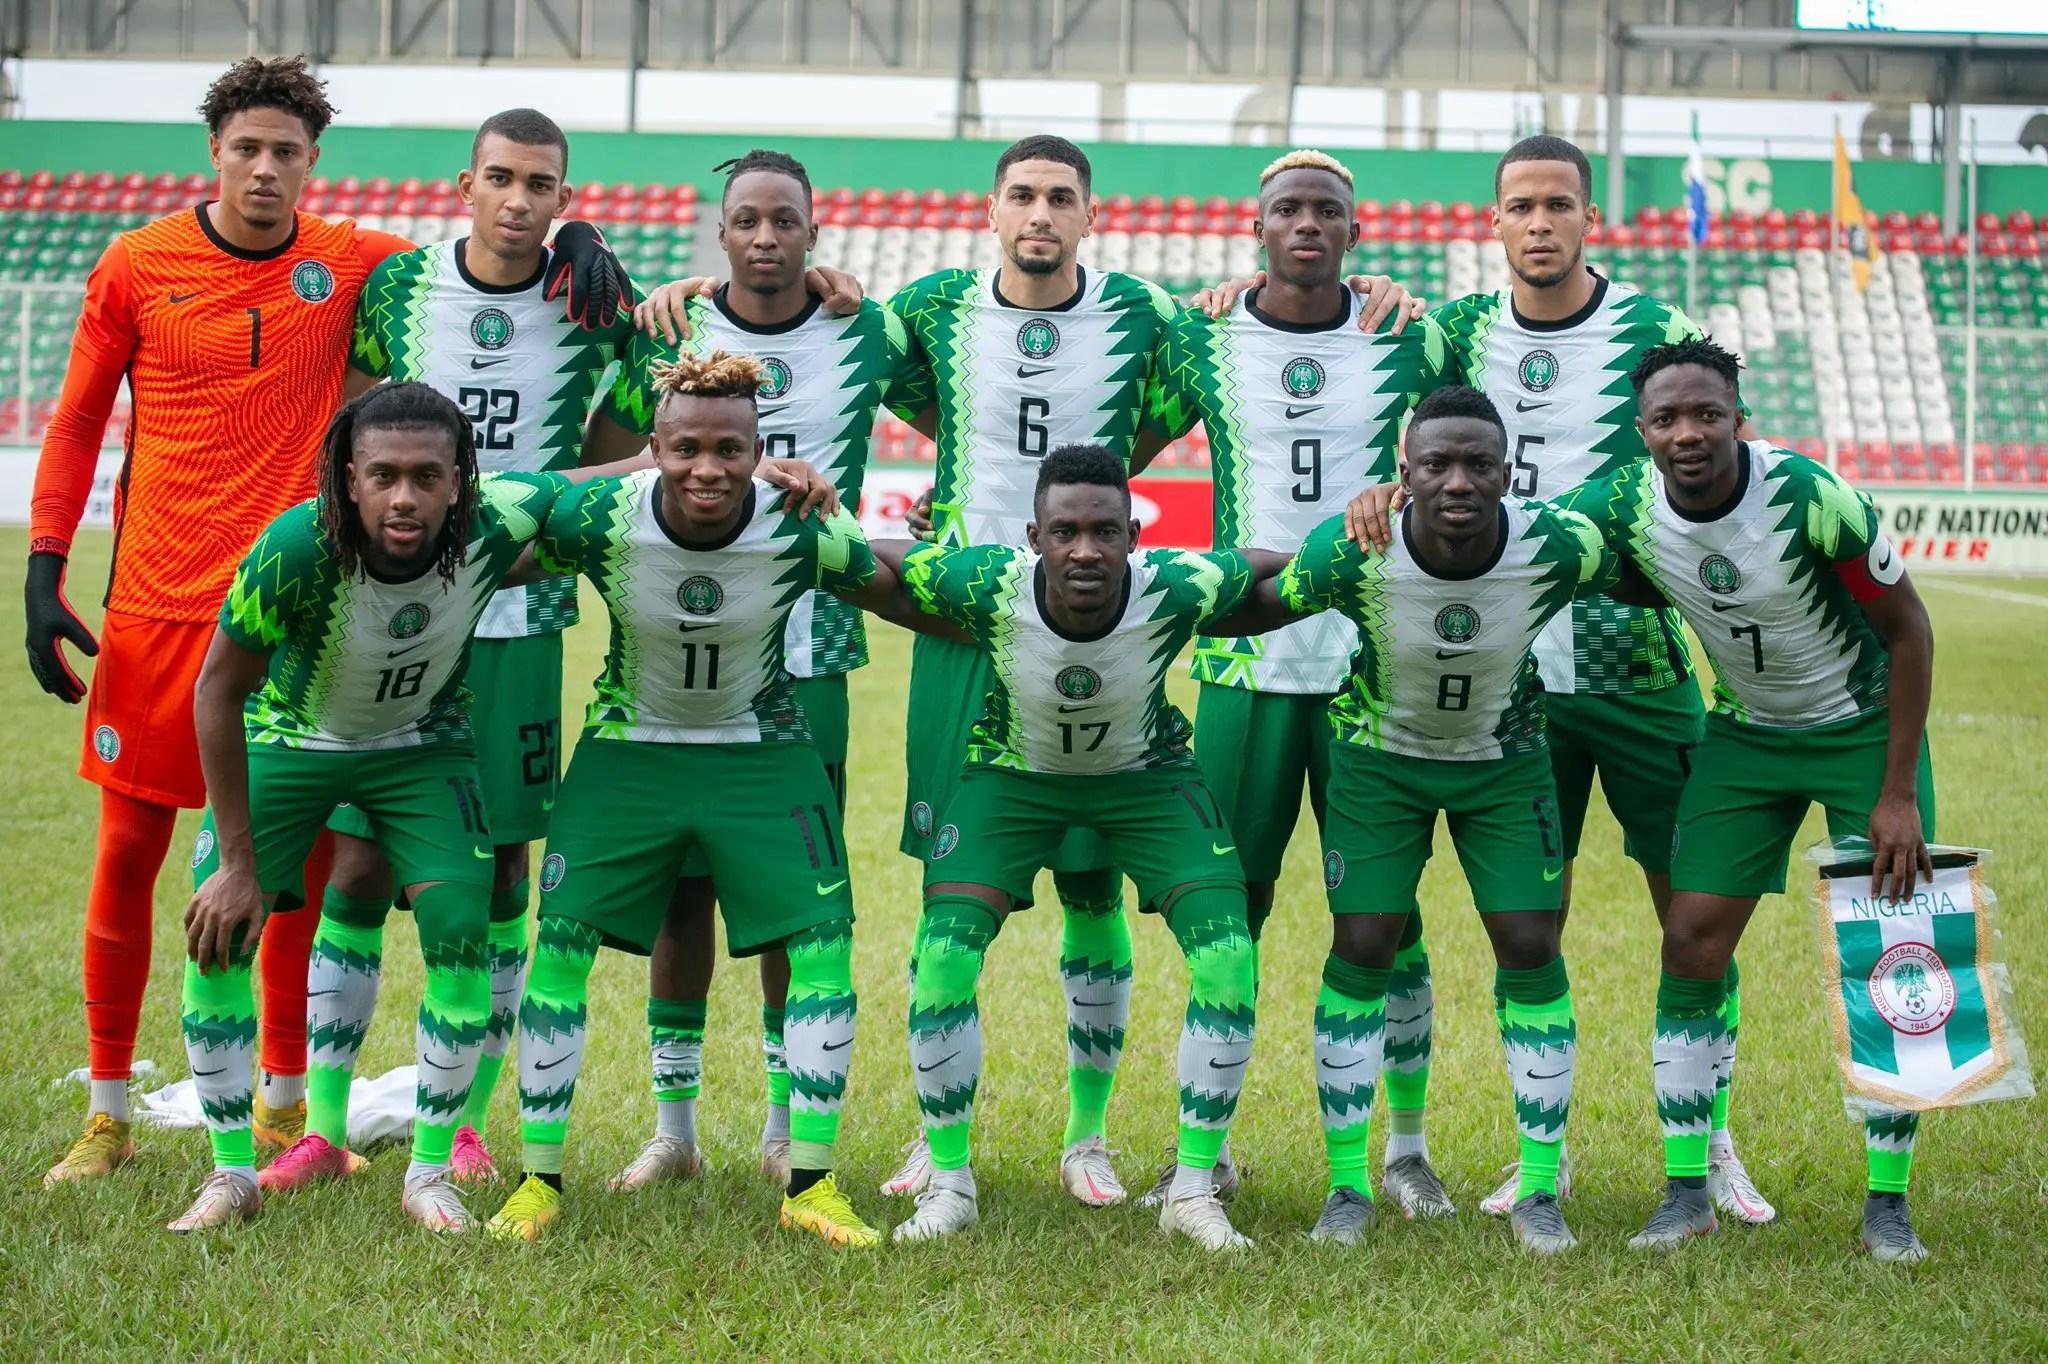 2021 AFCON Qualifiers: Super Eagles Coach, Rohr Invites Sadiq , Uzoho, Musa, 21 Others For Benin, Lesotho Games